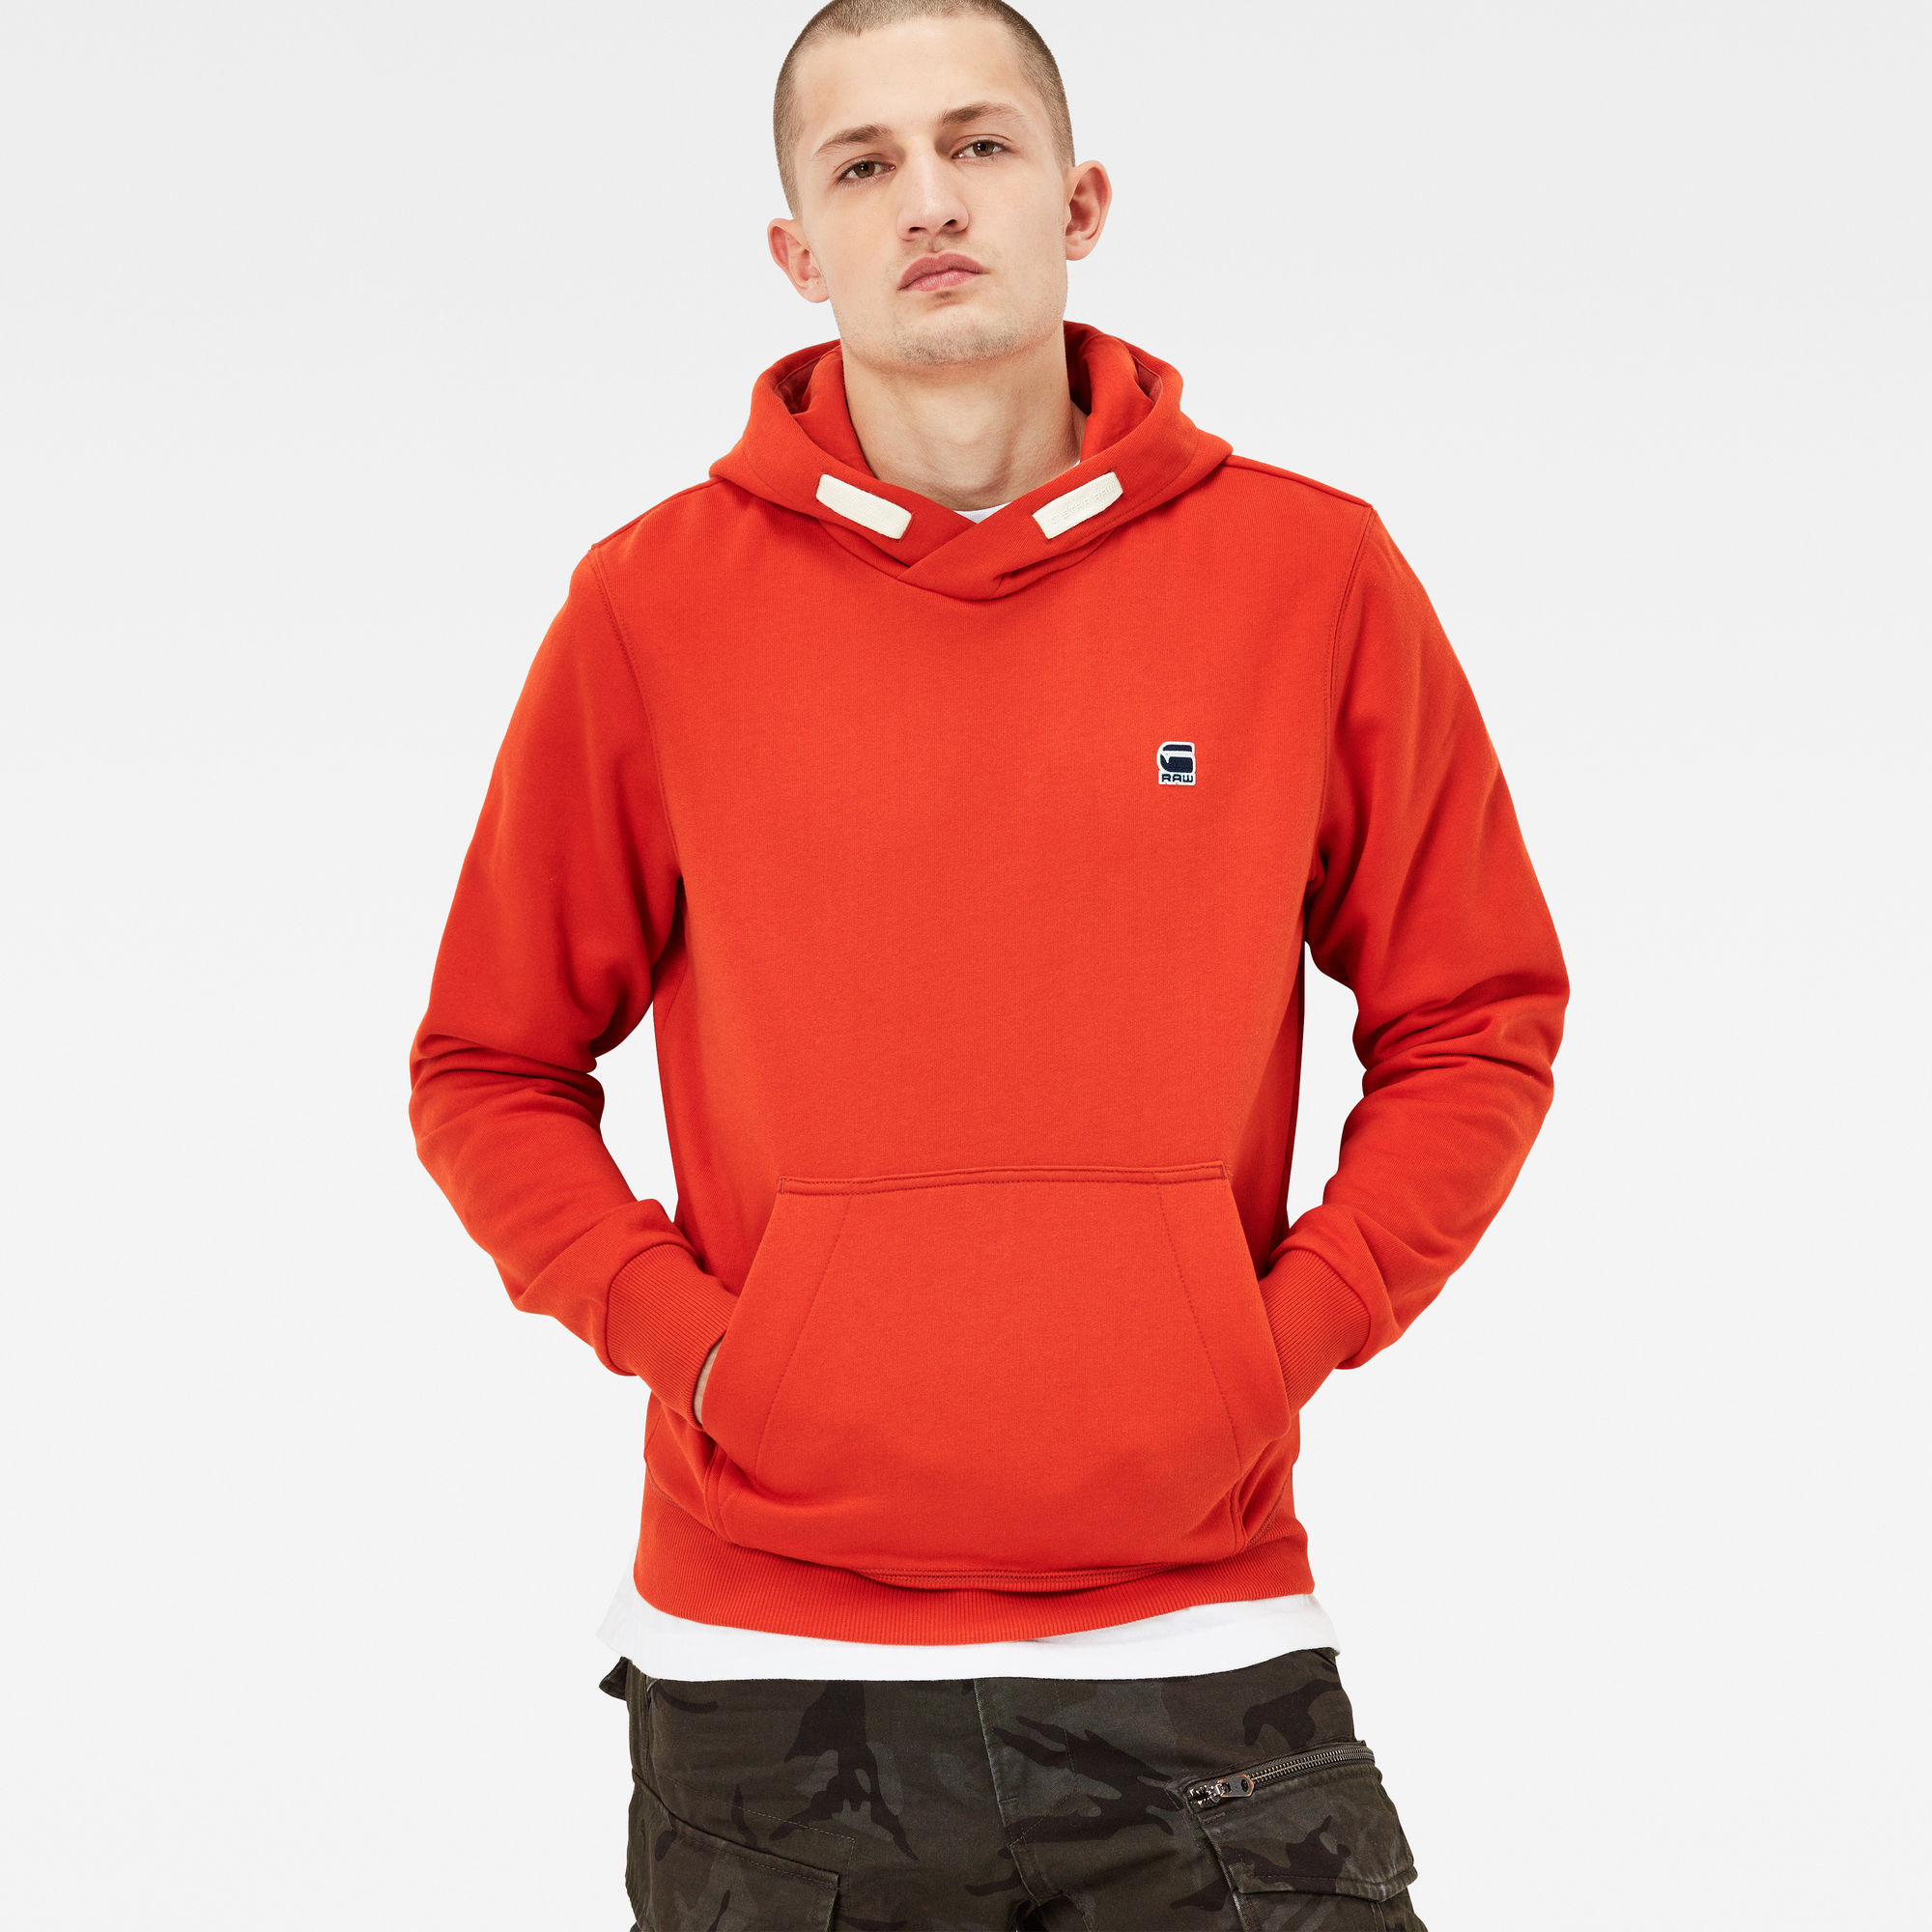 Chian Hooded Regular Fit Sweater